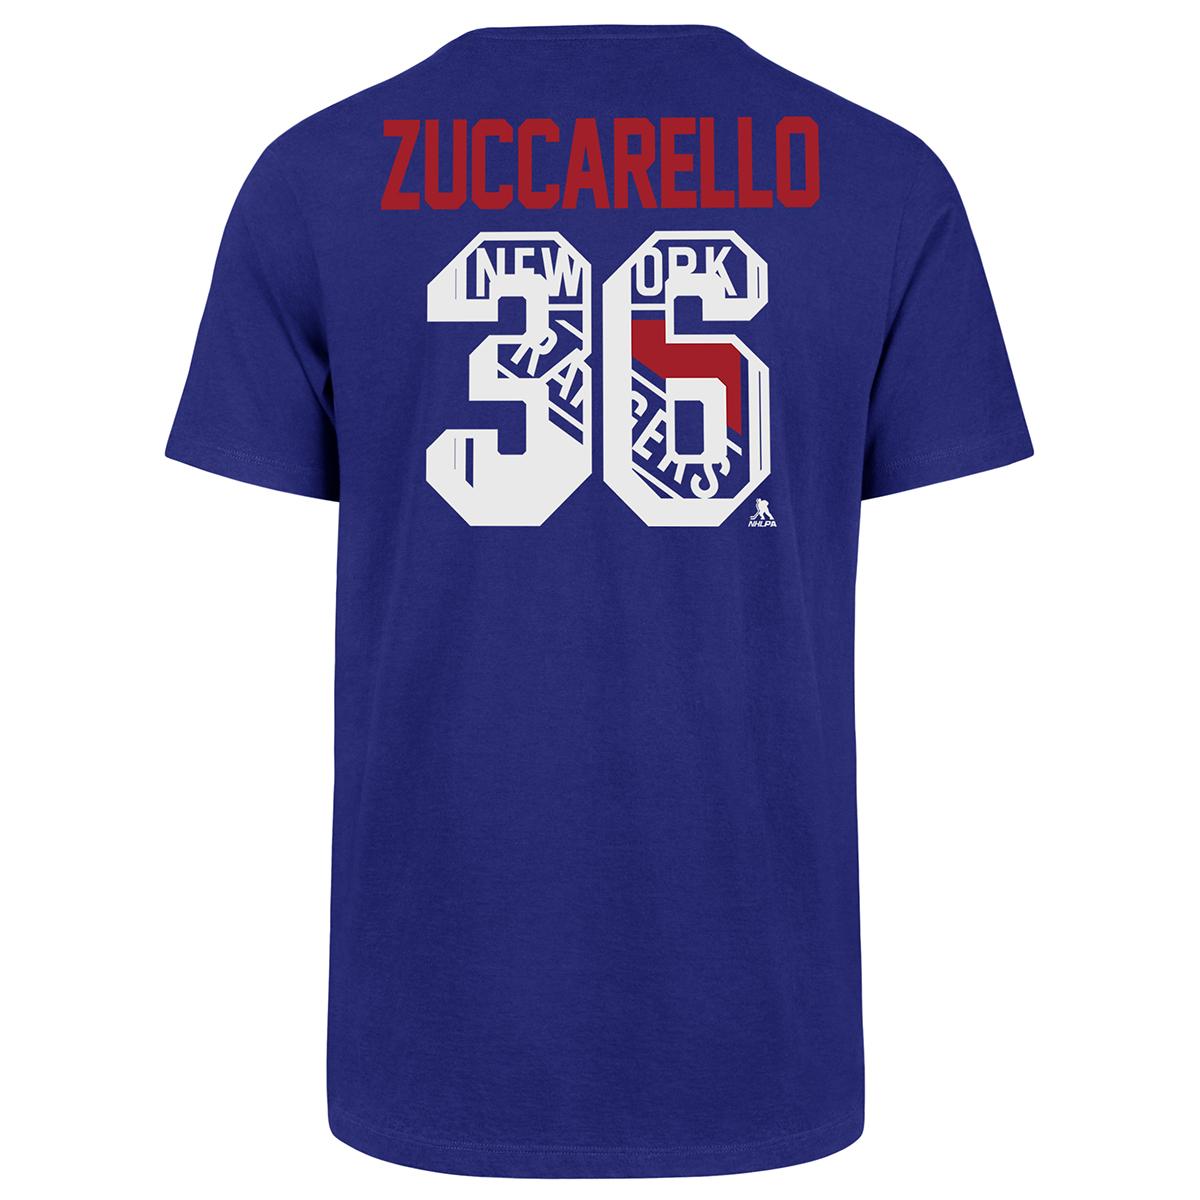 New York Rangers Men's Zuccarello Super Rival Short-Sleeve Tee - Blue, L